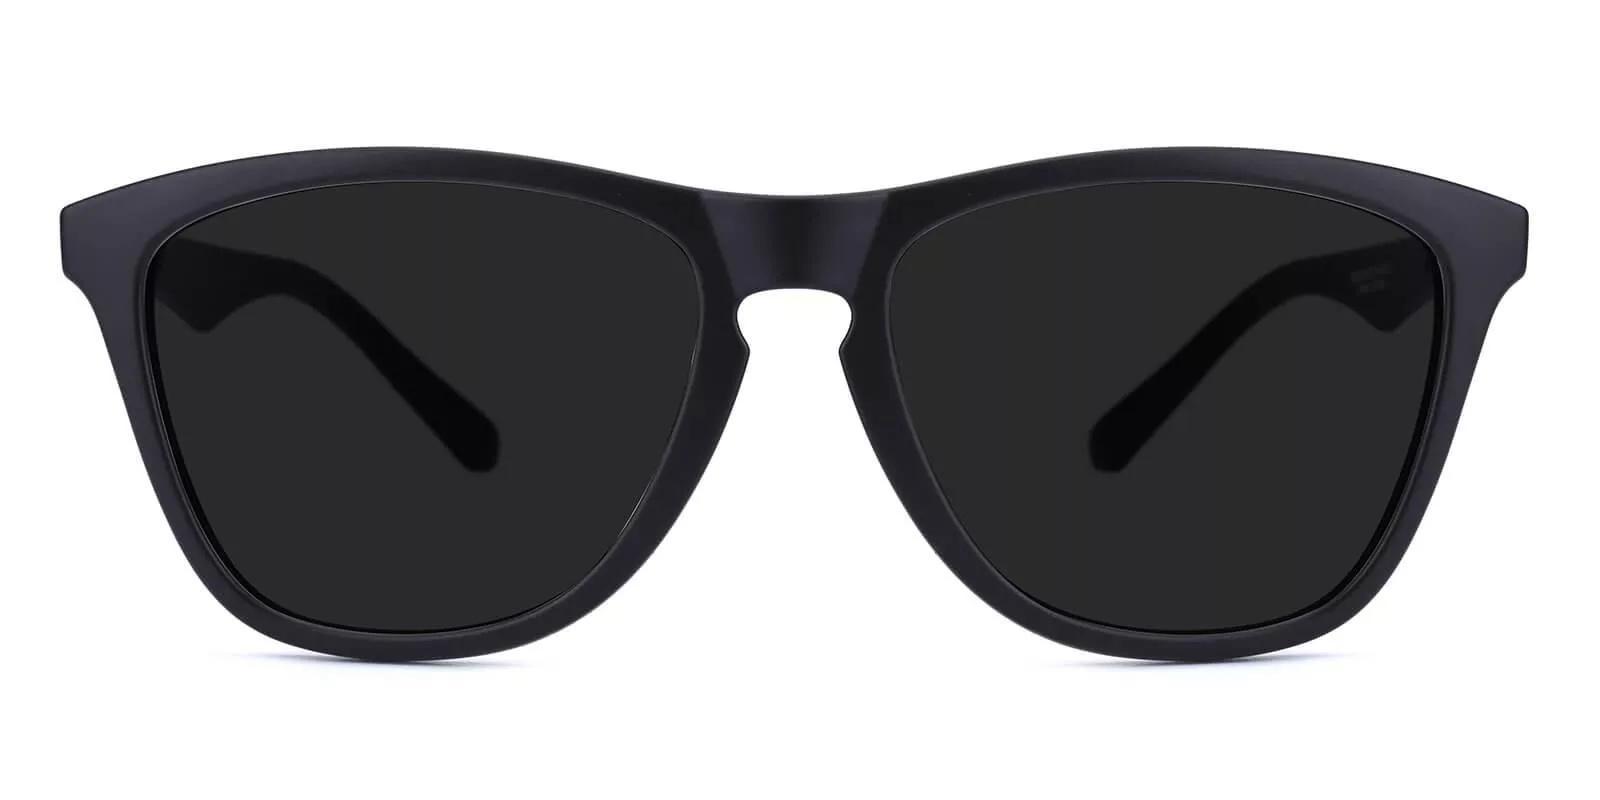 Bentleyville Black TR Sunglasses , UniversalBridgeFit Frames from ABBE Glasses